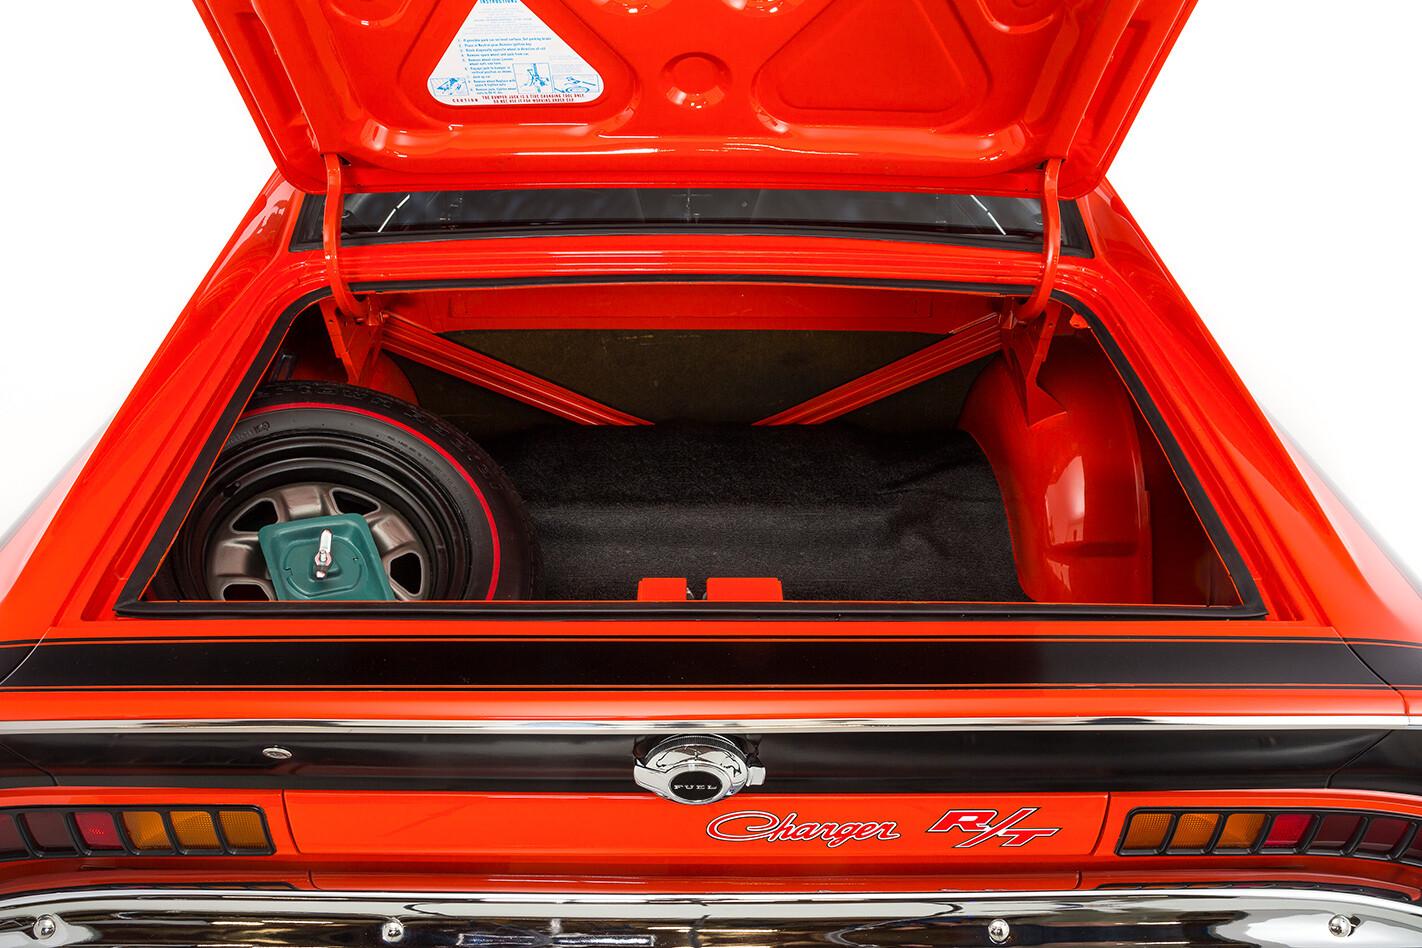 Chrysler Charger boot